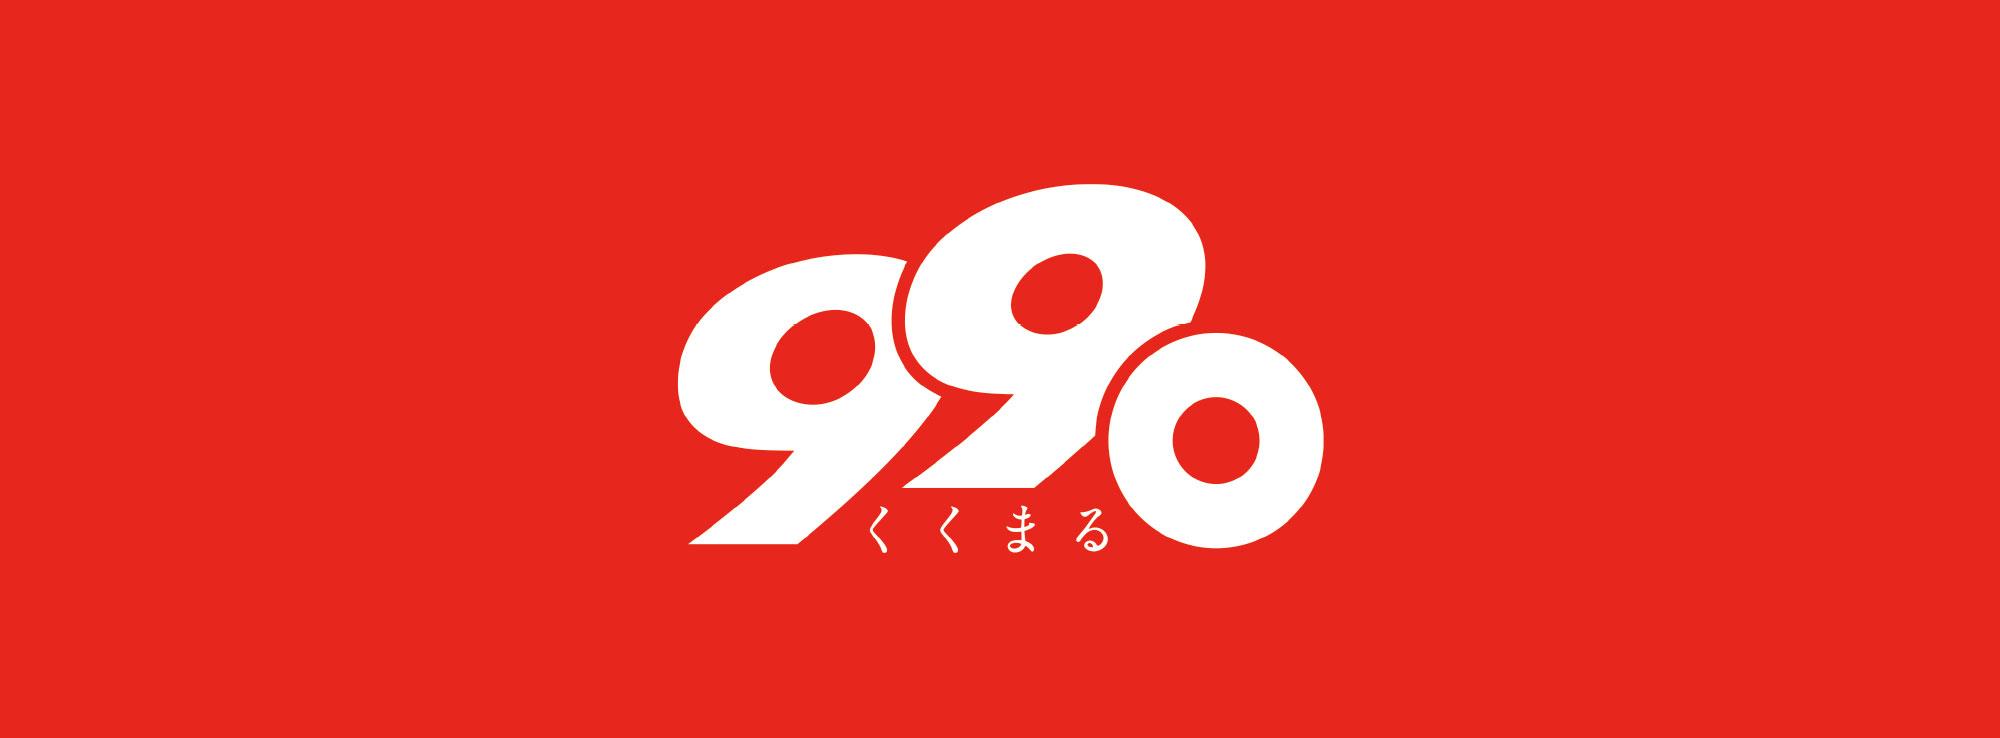 990_logo